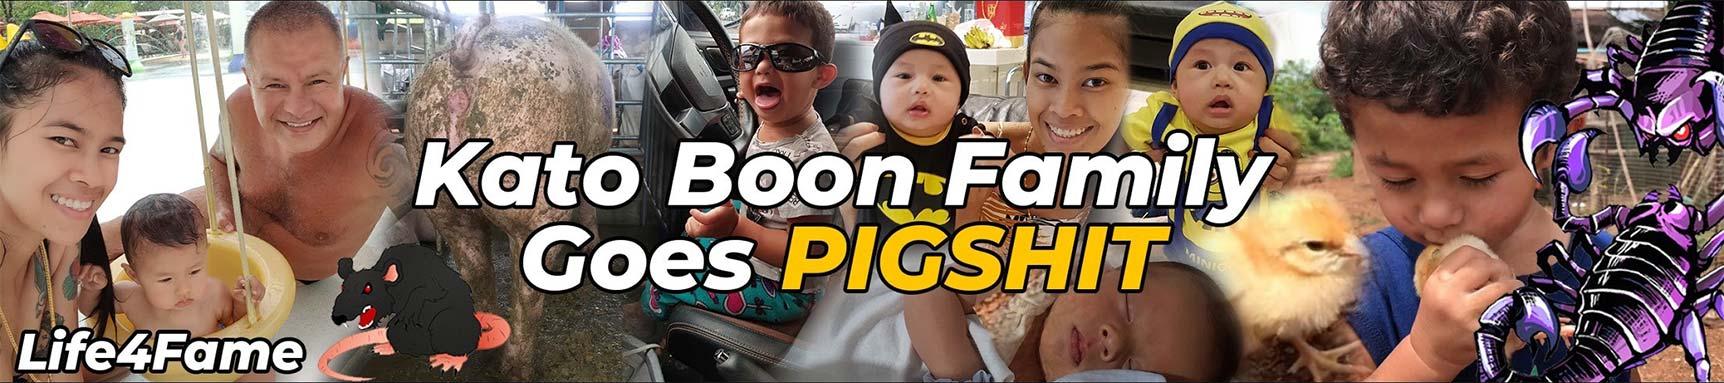 Kato Boon Family